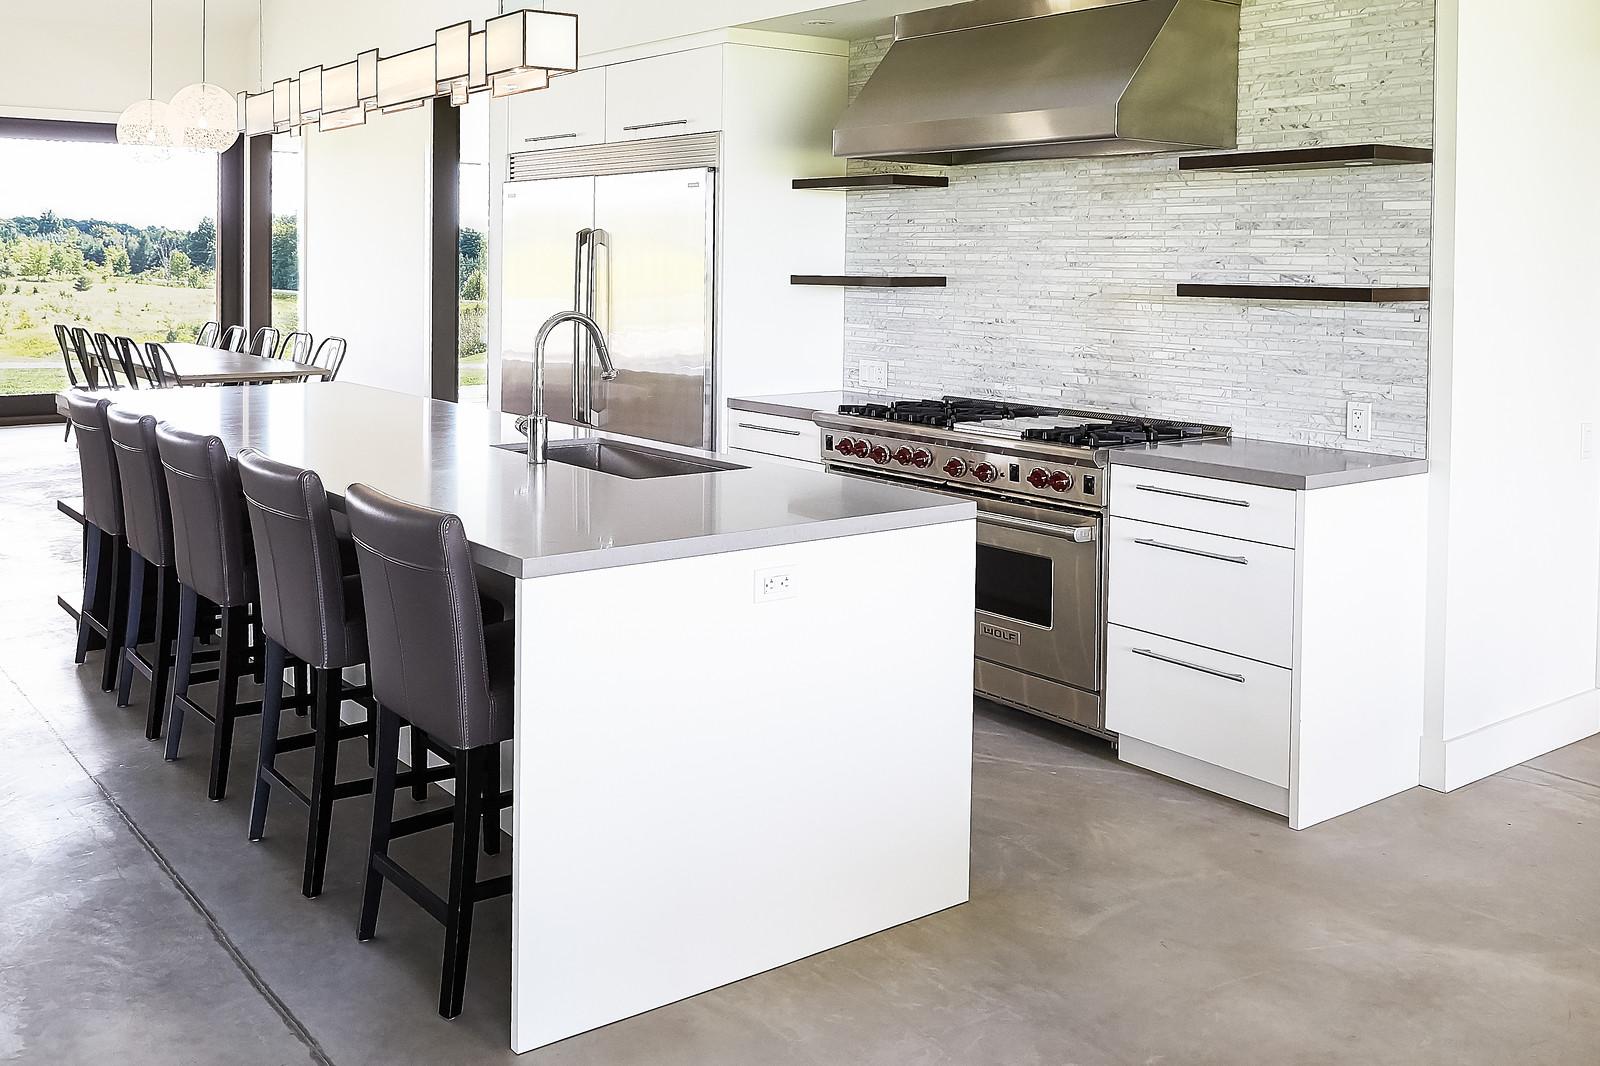 caledon-kitchen.JPG